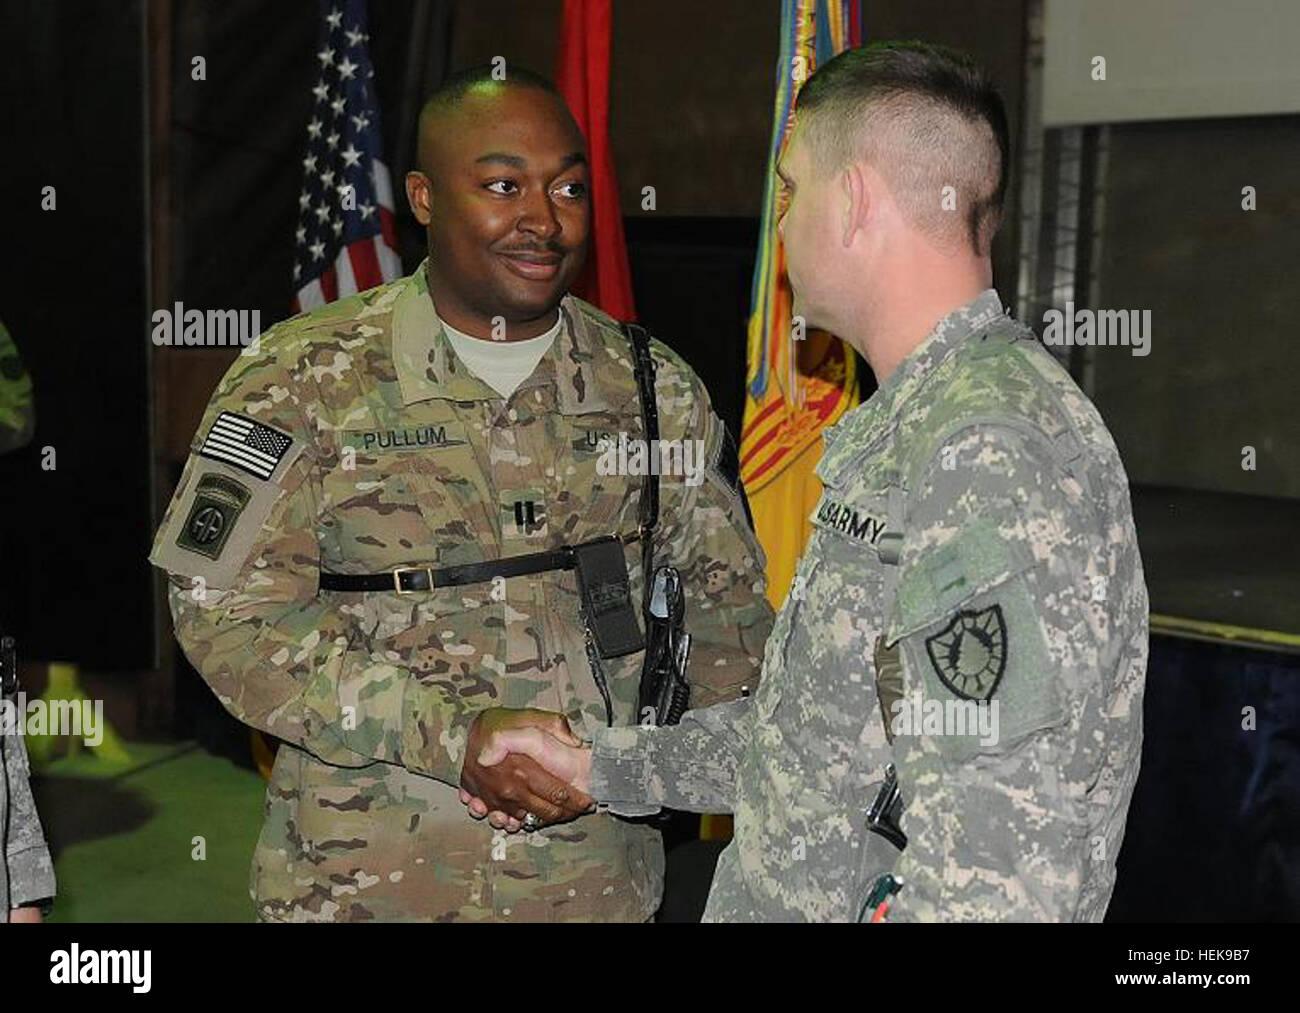 Capt Courtney Pullum 1165th Military Police Company Alabama Army Stock Photo Alamy